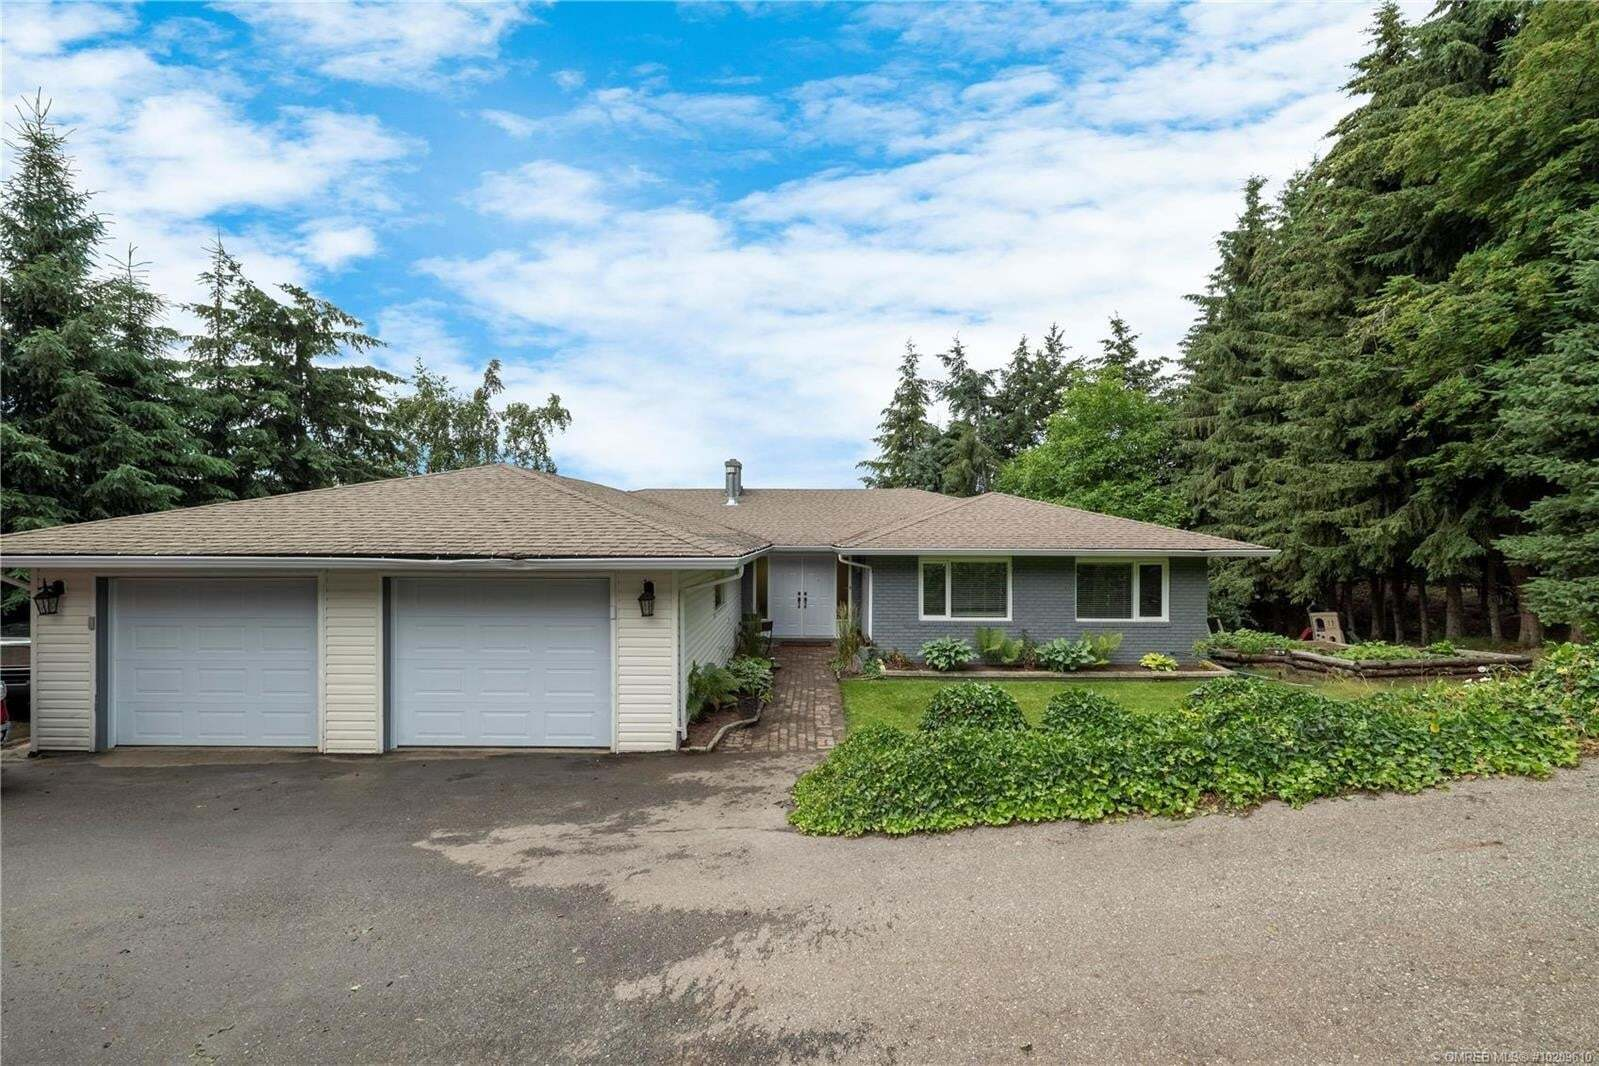 House for sale at 444 Ridgemont Dr Coldstream British Columbia - MLS: 10209610